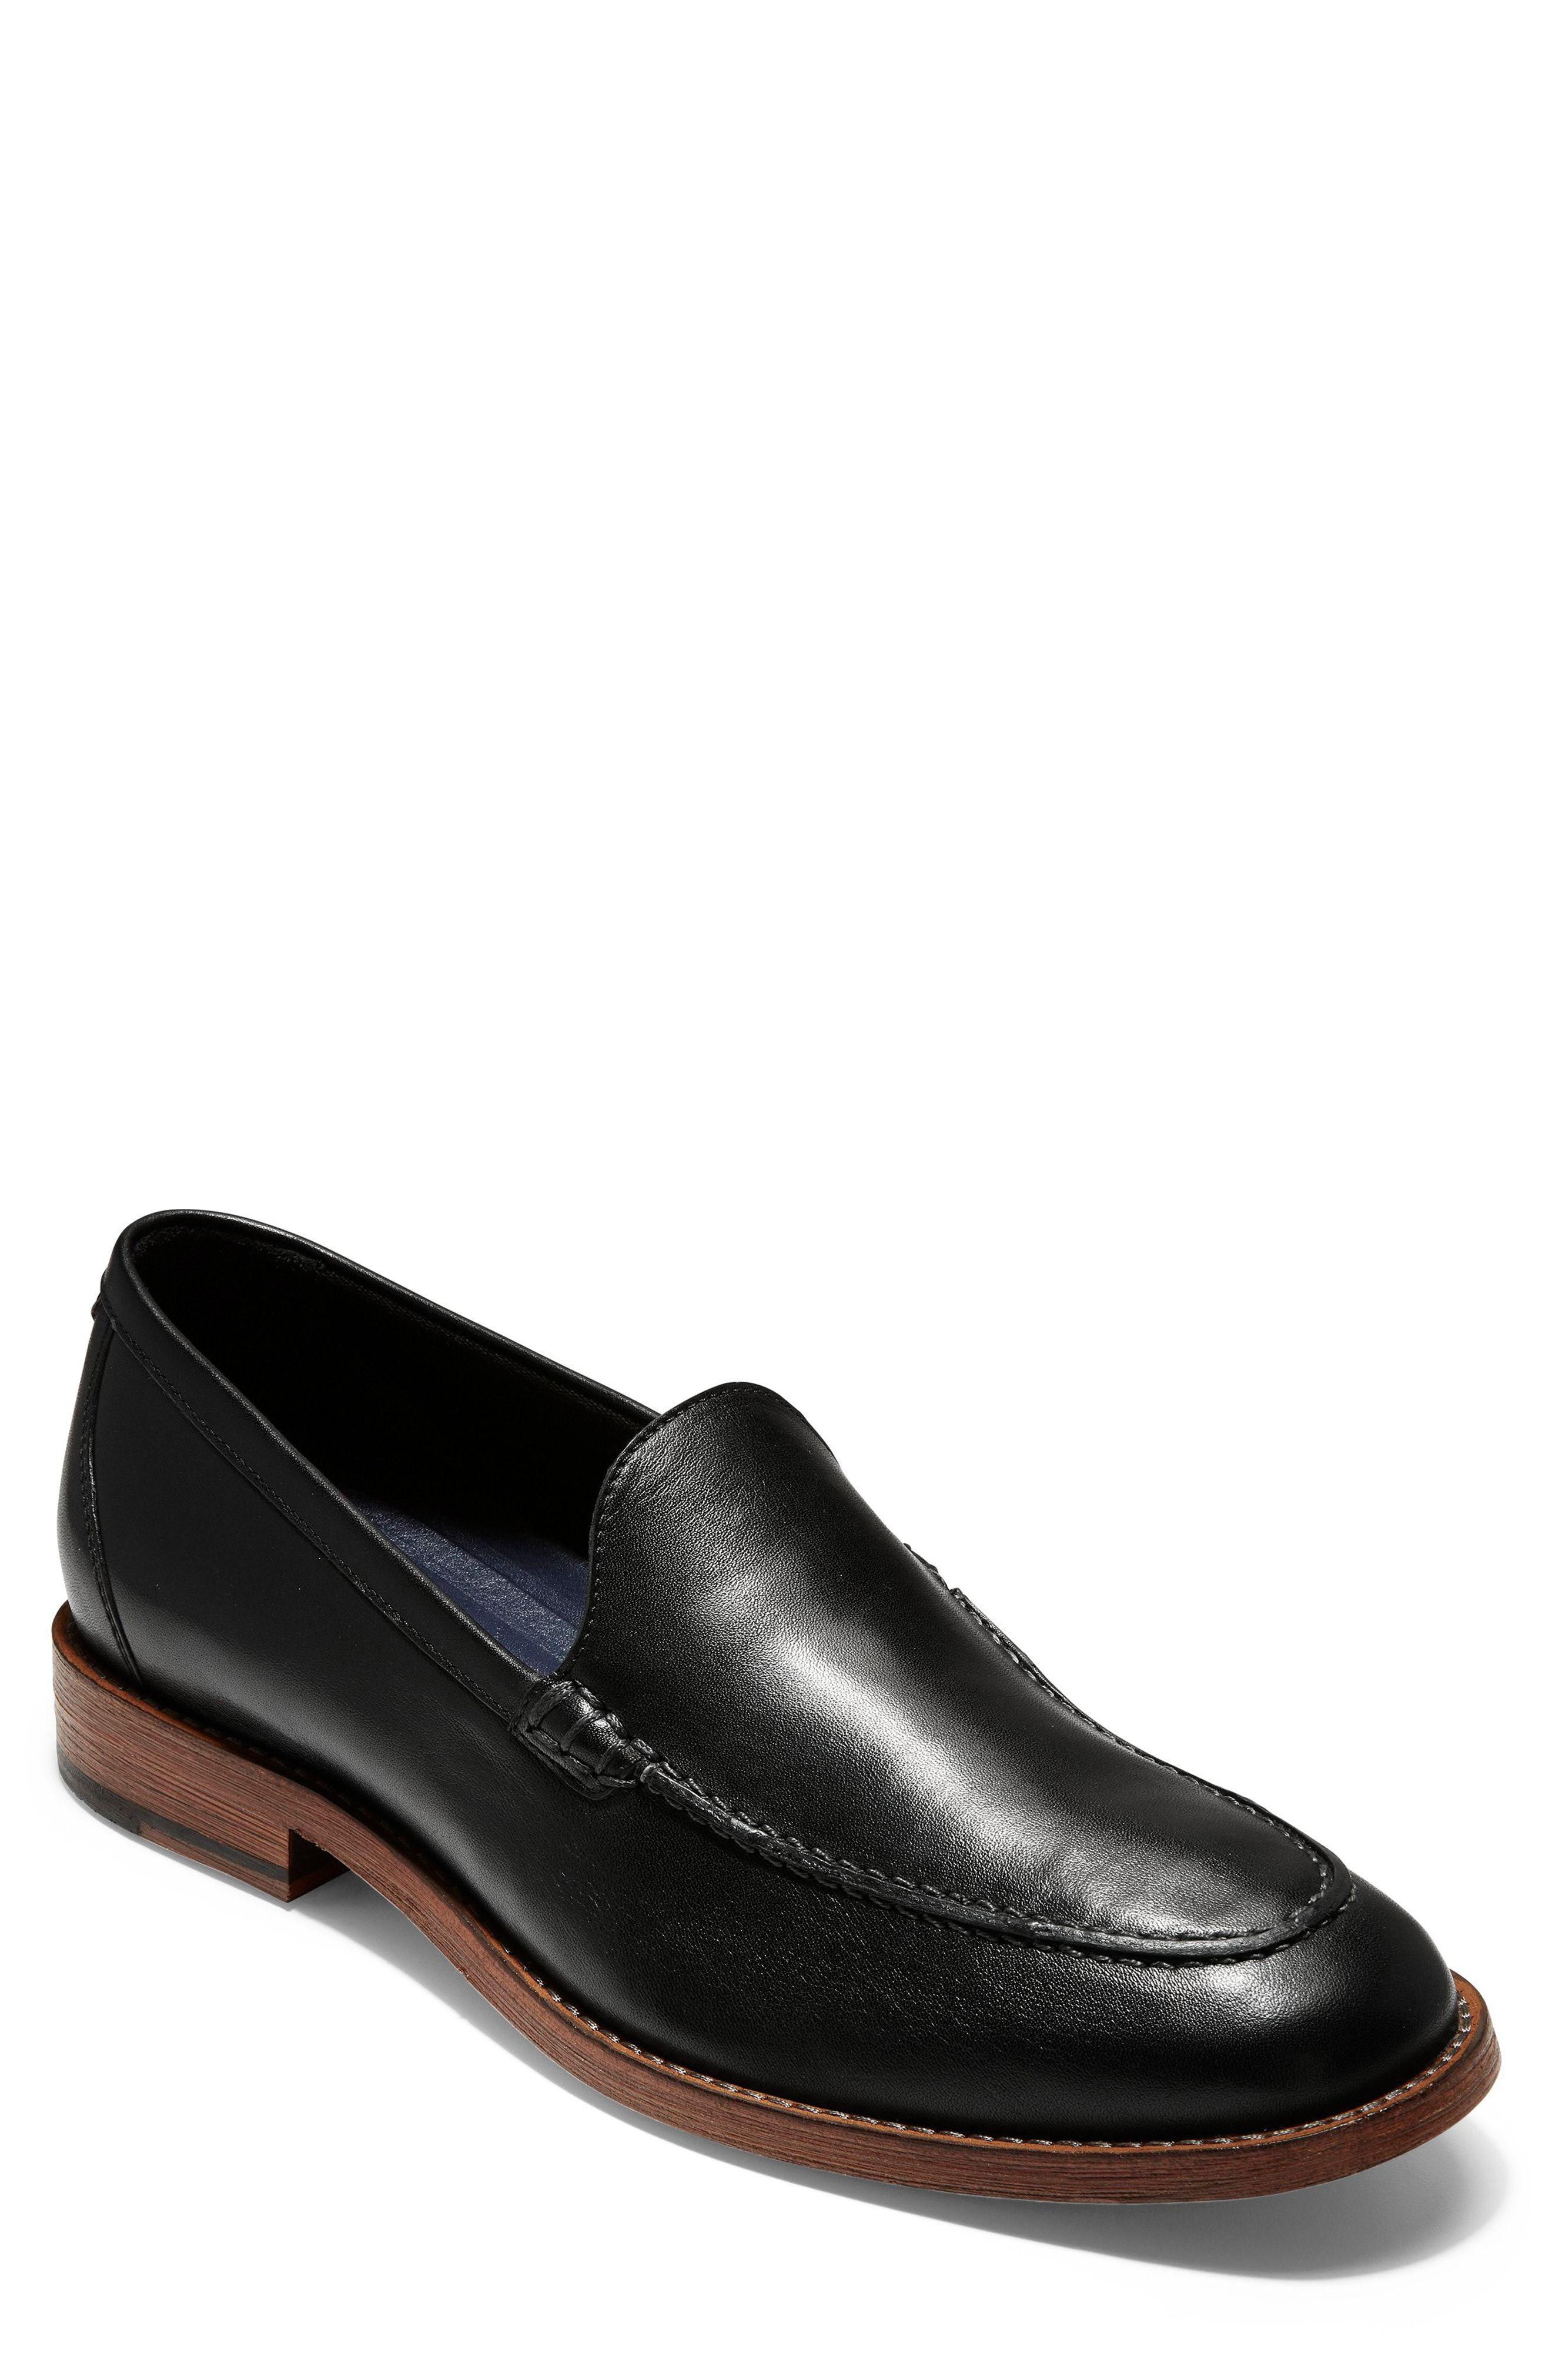 068e8c83b1f74 COLE HAAN FEATHERCRAFT GRAND VENETIAN LOAFER.  colehaan  shoes ...